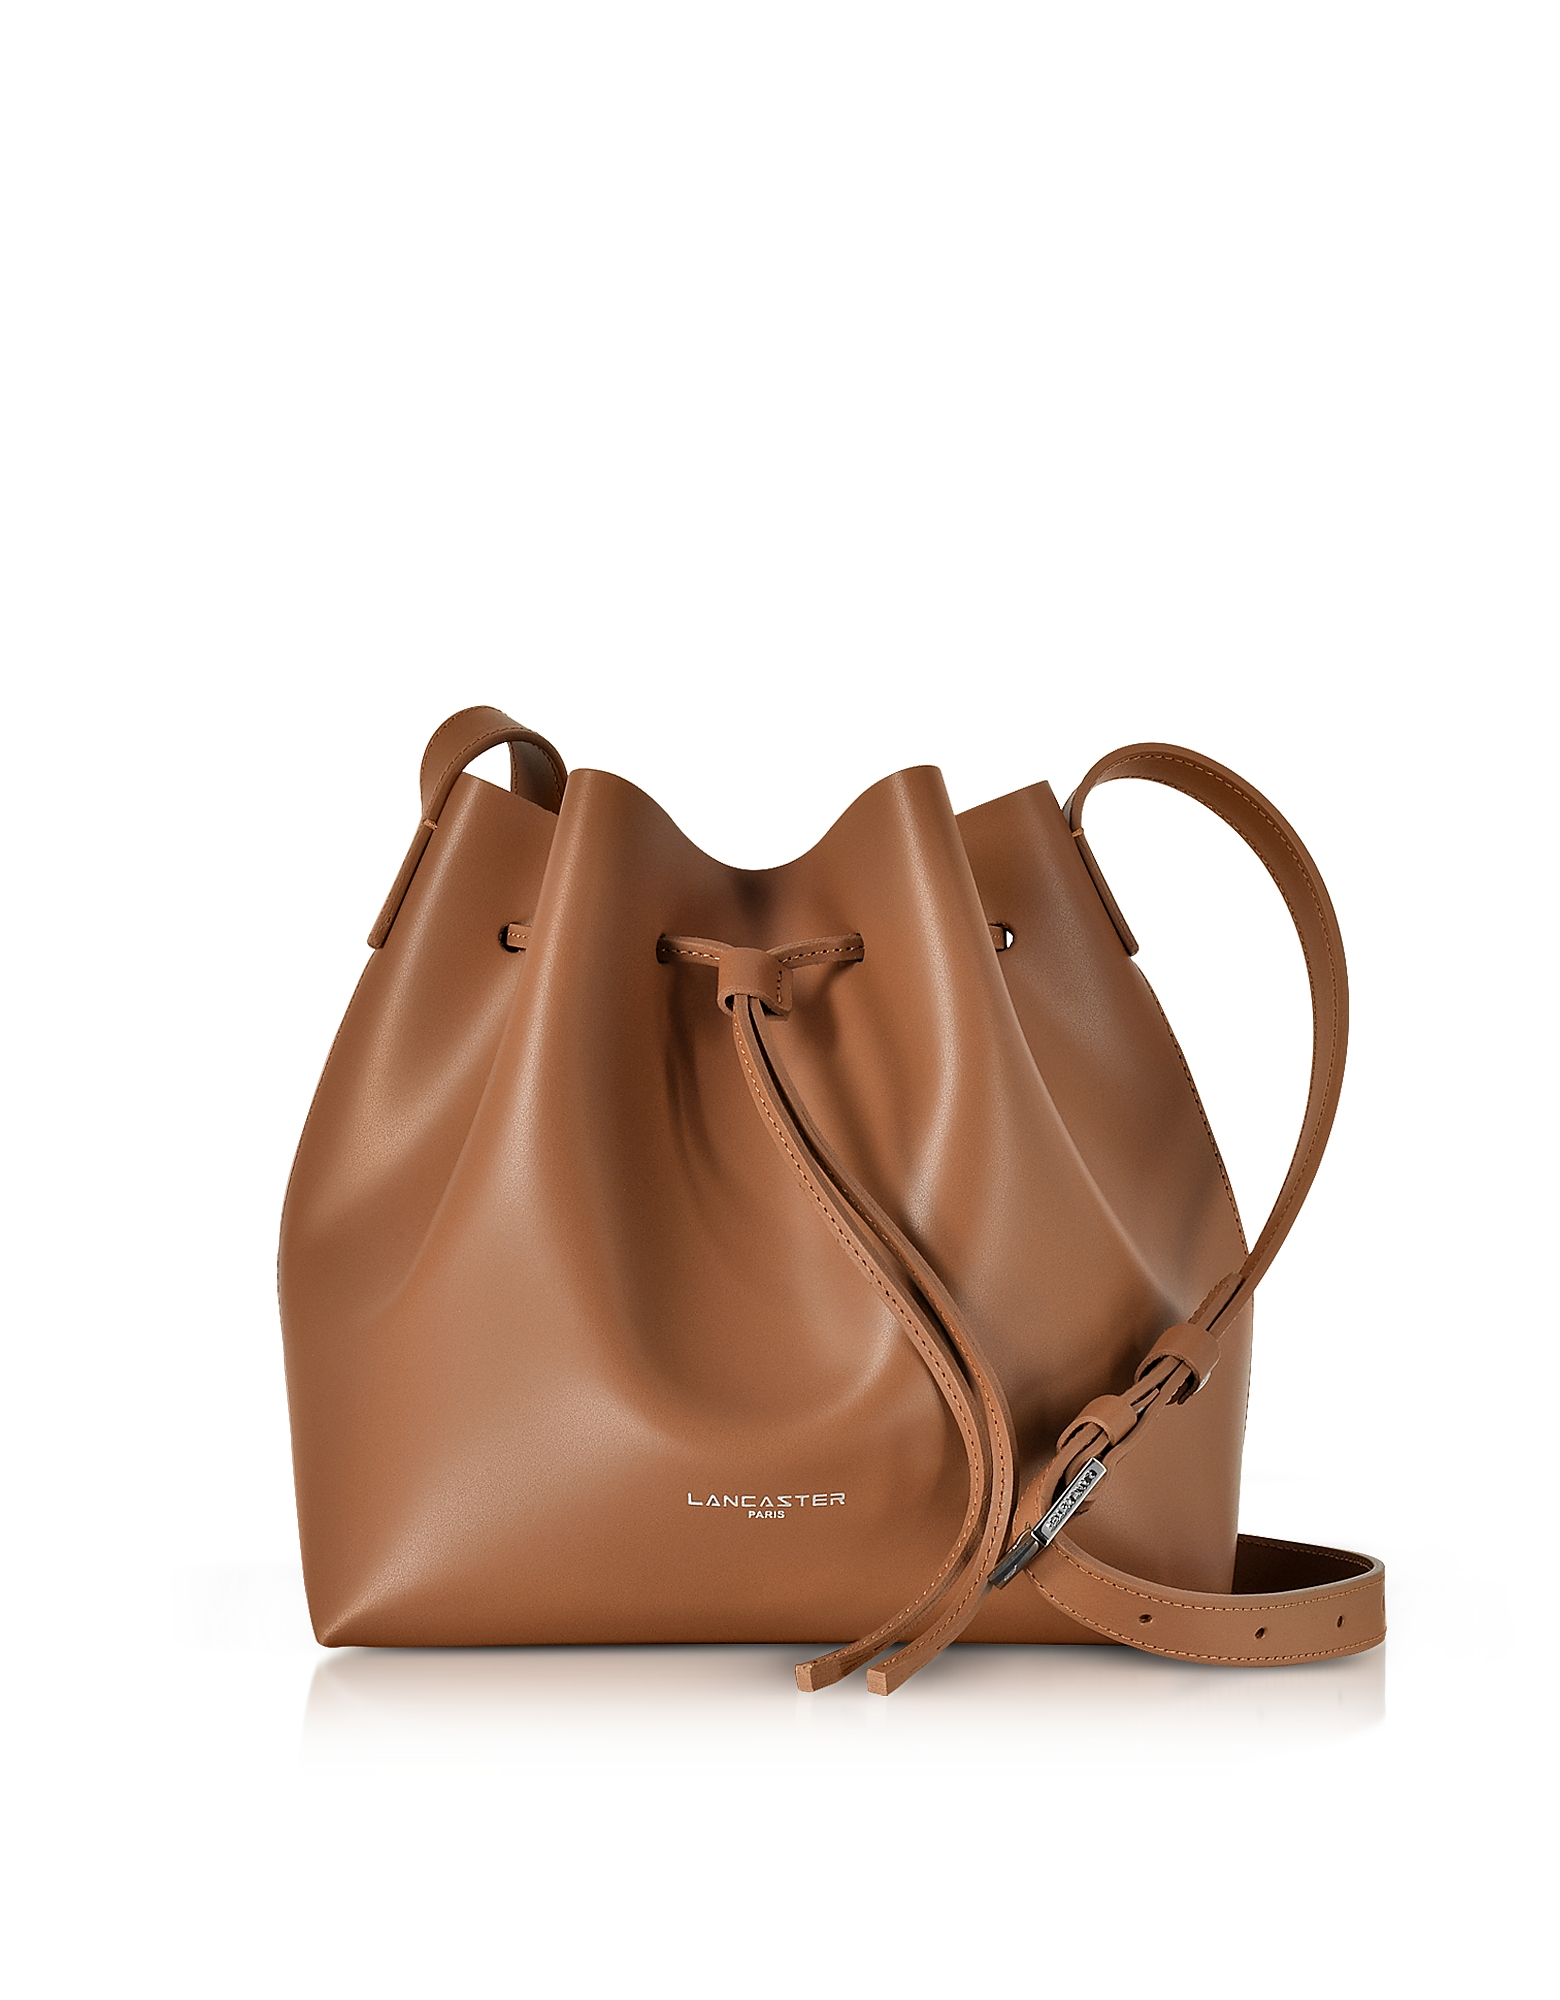 Lancaster Paris Handbags, Pur & Element Smooth Leather Small Bucket Bag